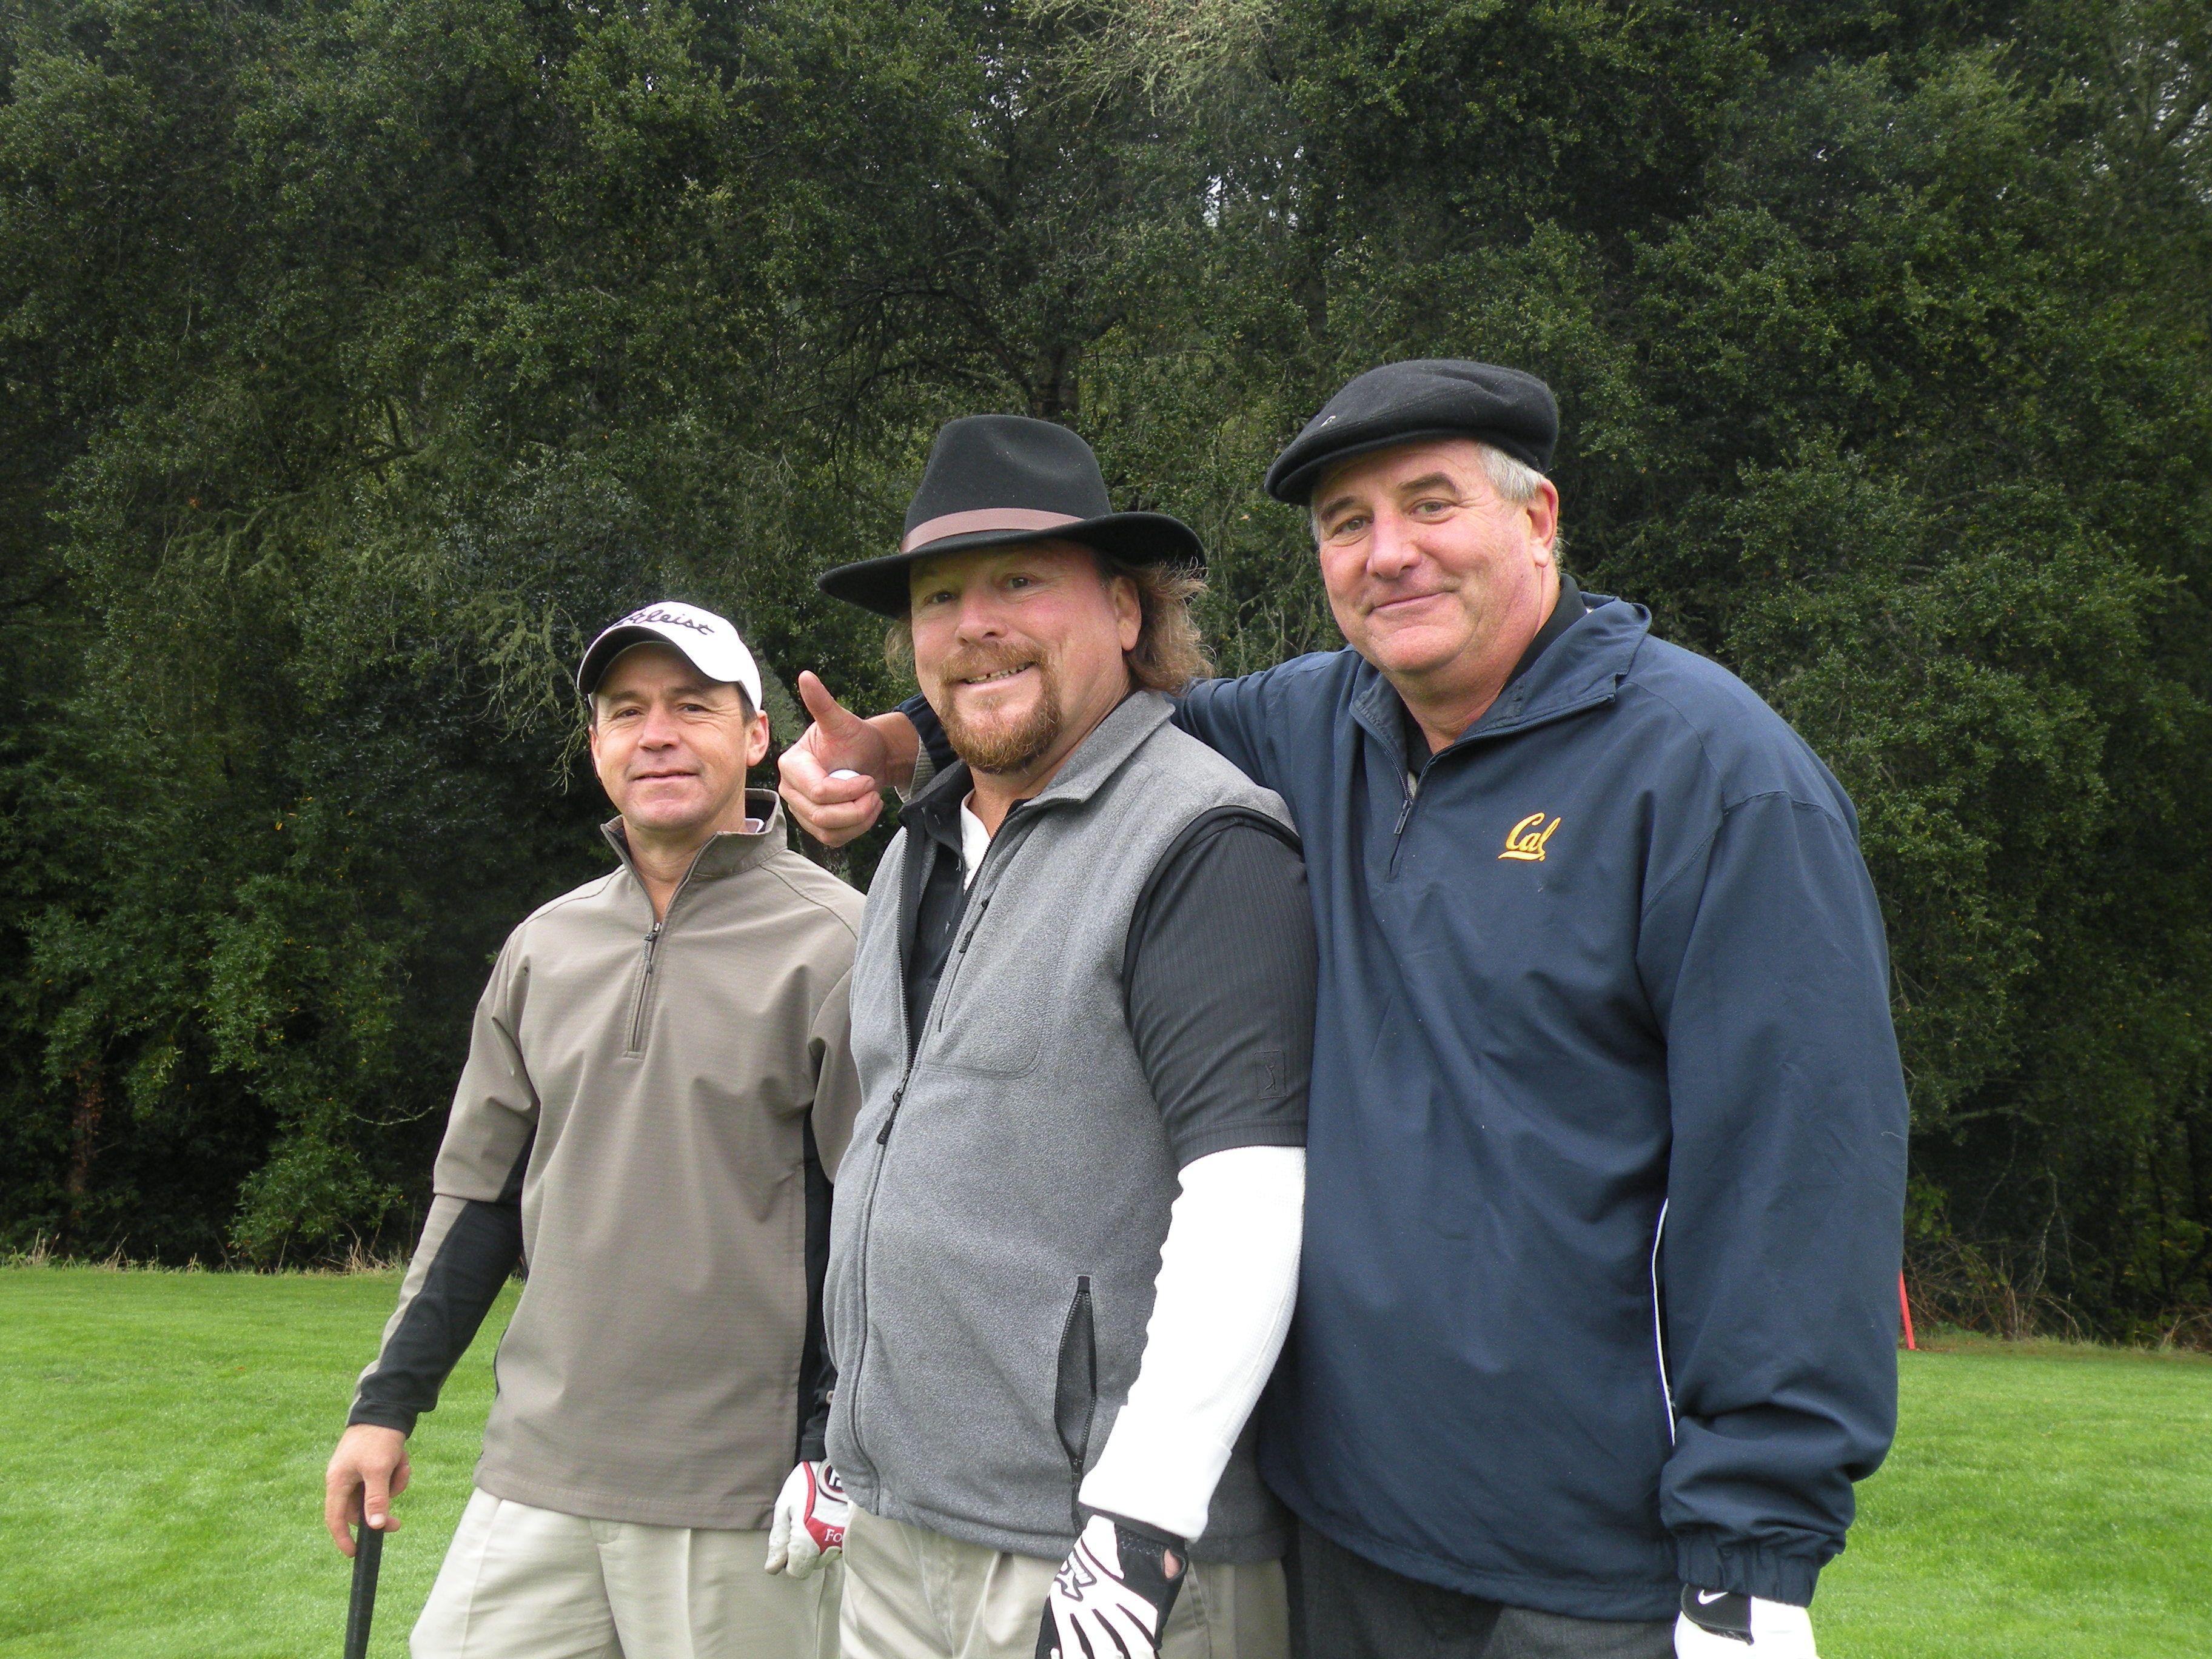 Marin Luxury Cars Golf Tournament Golf Tournament Marines Windbreaker